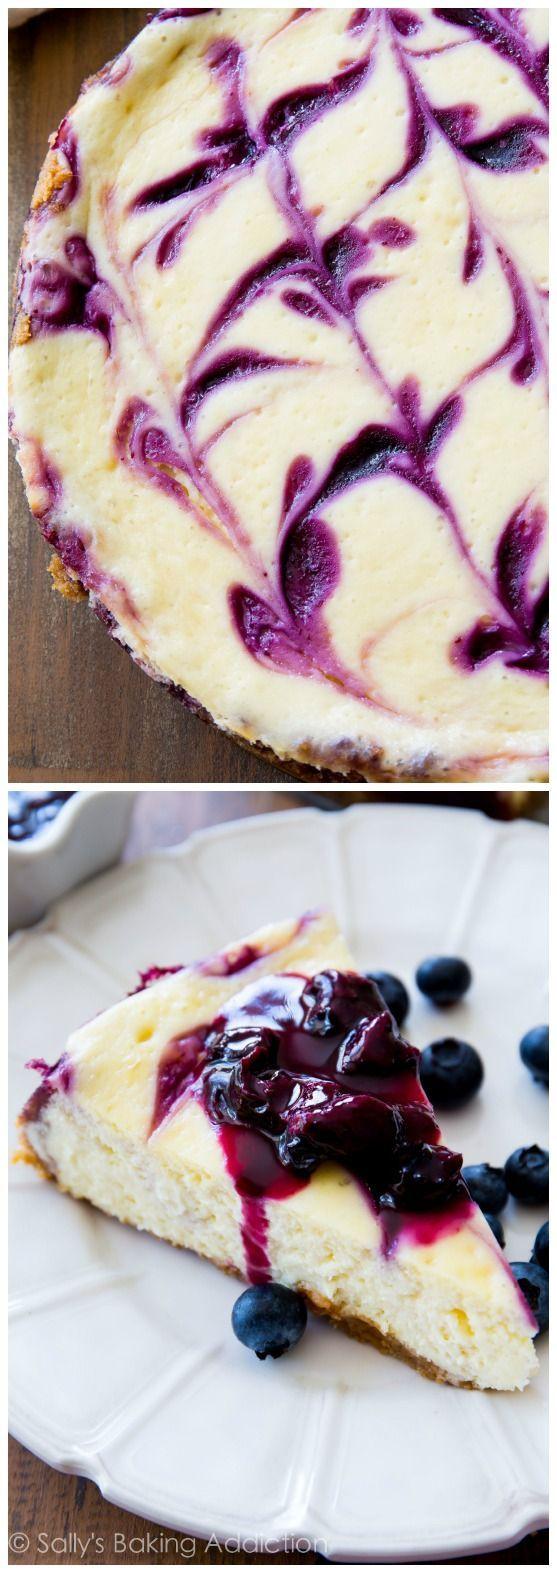 creamy homemade cheesecake swirled with a sweet blueberry swirl. All on top of my favorite buttery graham cracker crust! sallysbakinga...